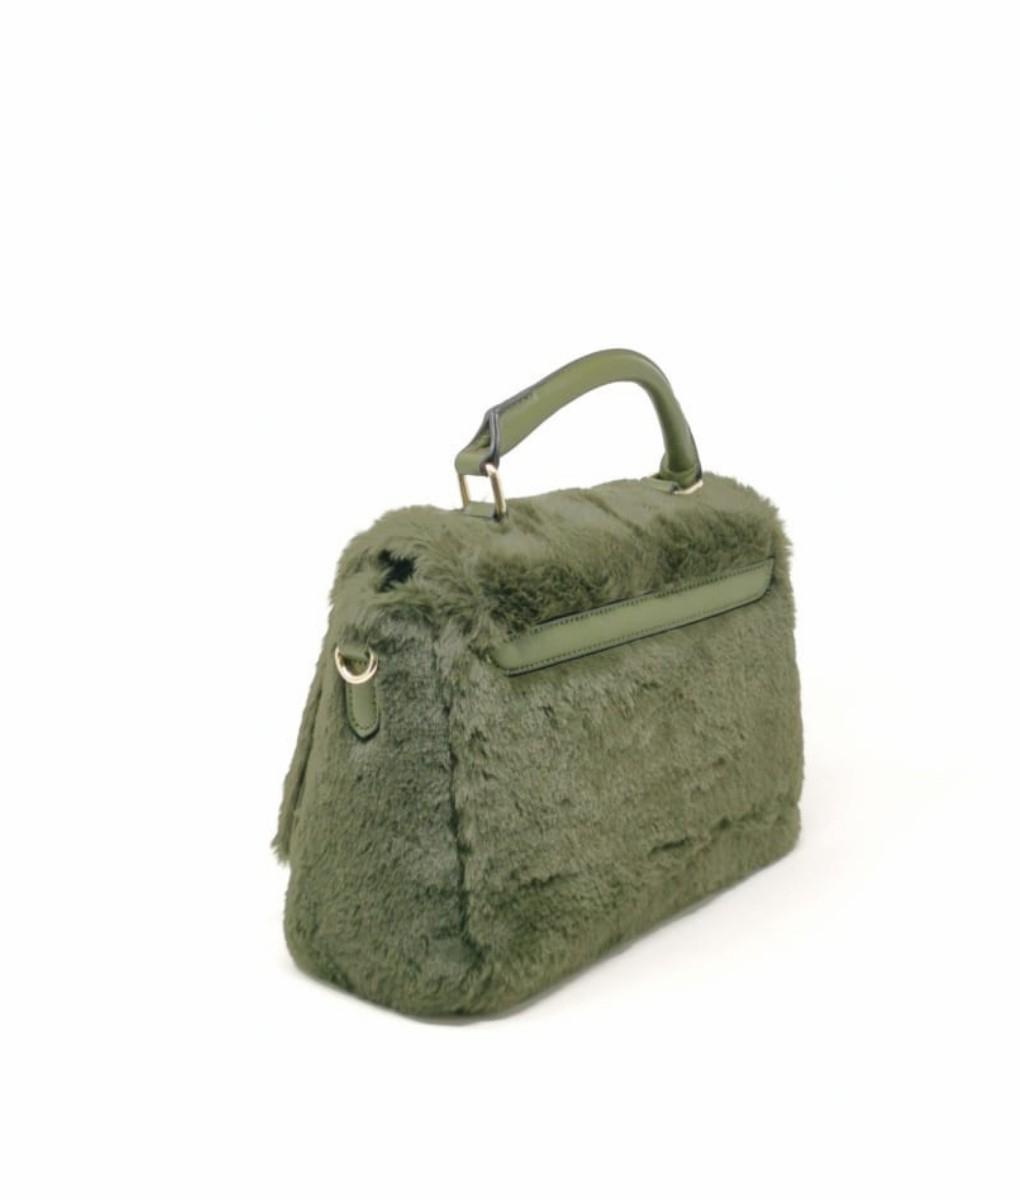 GRY-GREEN BAG